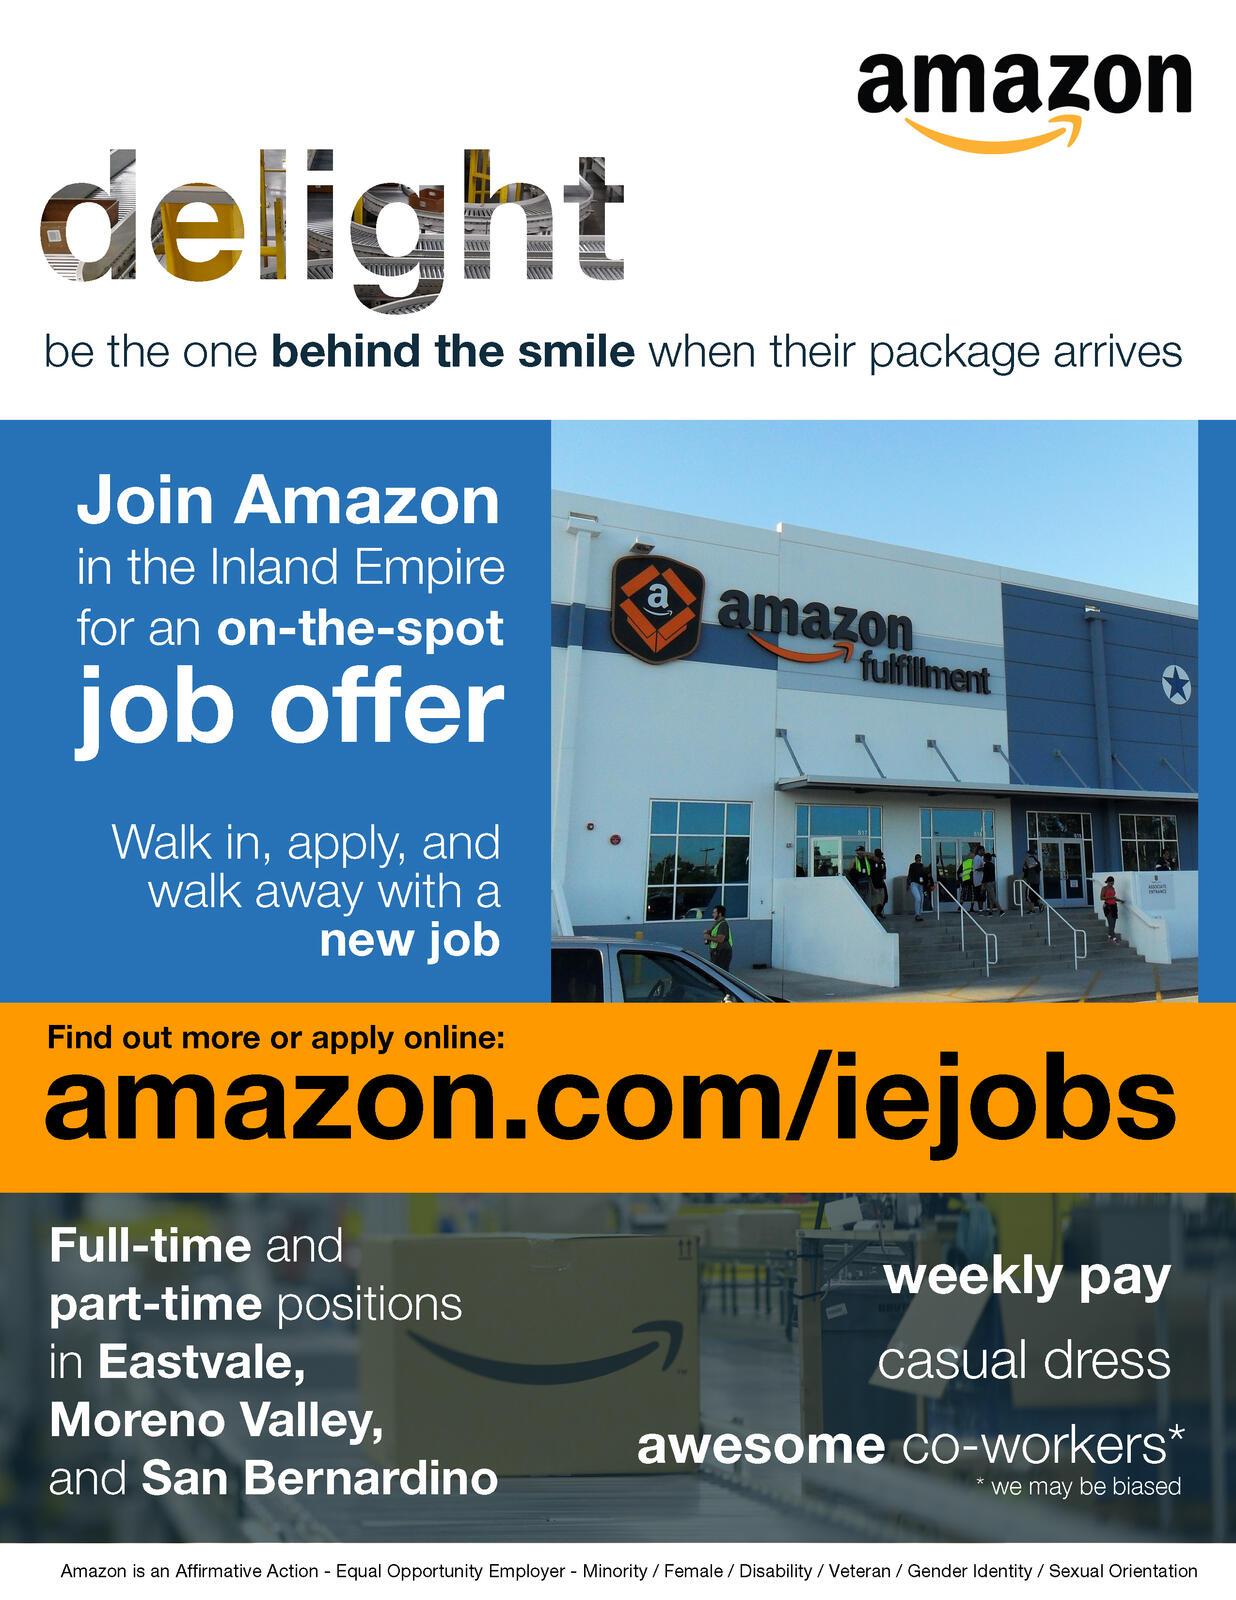 Amazon Com Applicationhelp >> Moreno Valley To Host Amazon S Recruitment To Fill 10 000